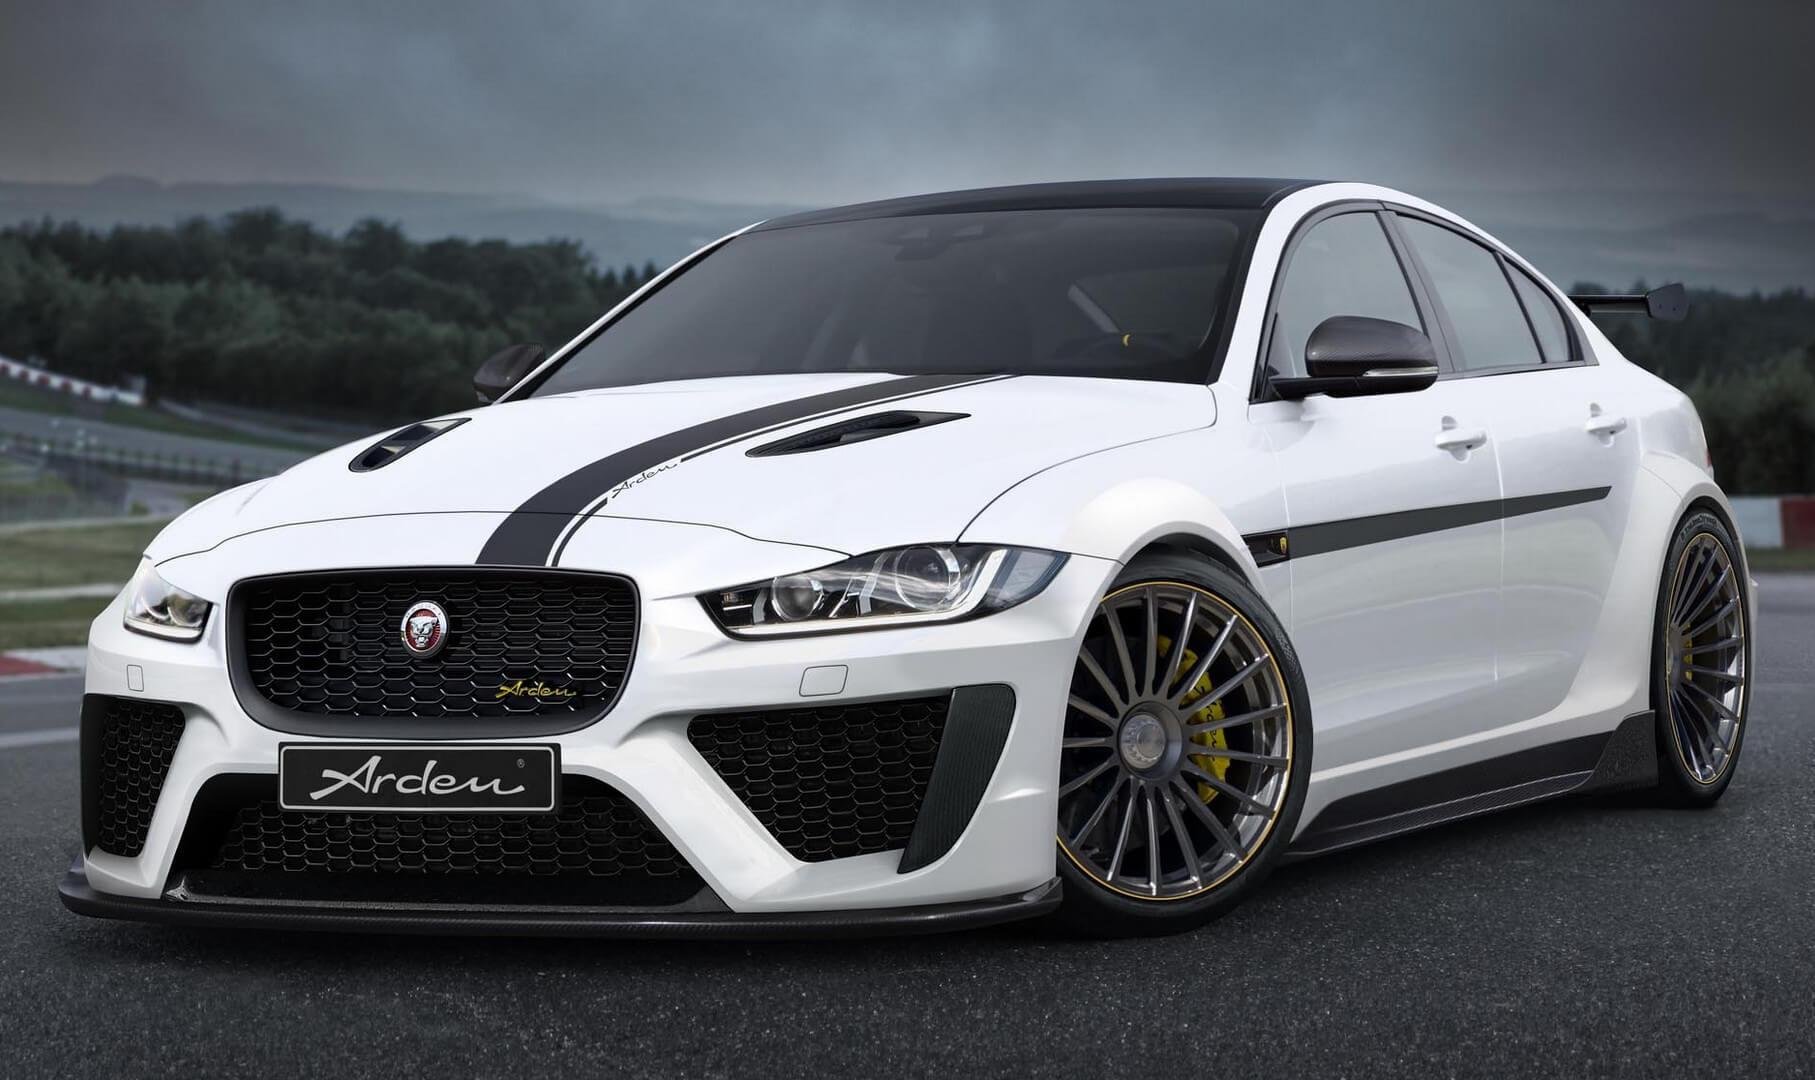 Arden Develops Neat Upgrade Kit For Jaguar Xe S Performancedrive